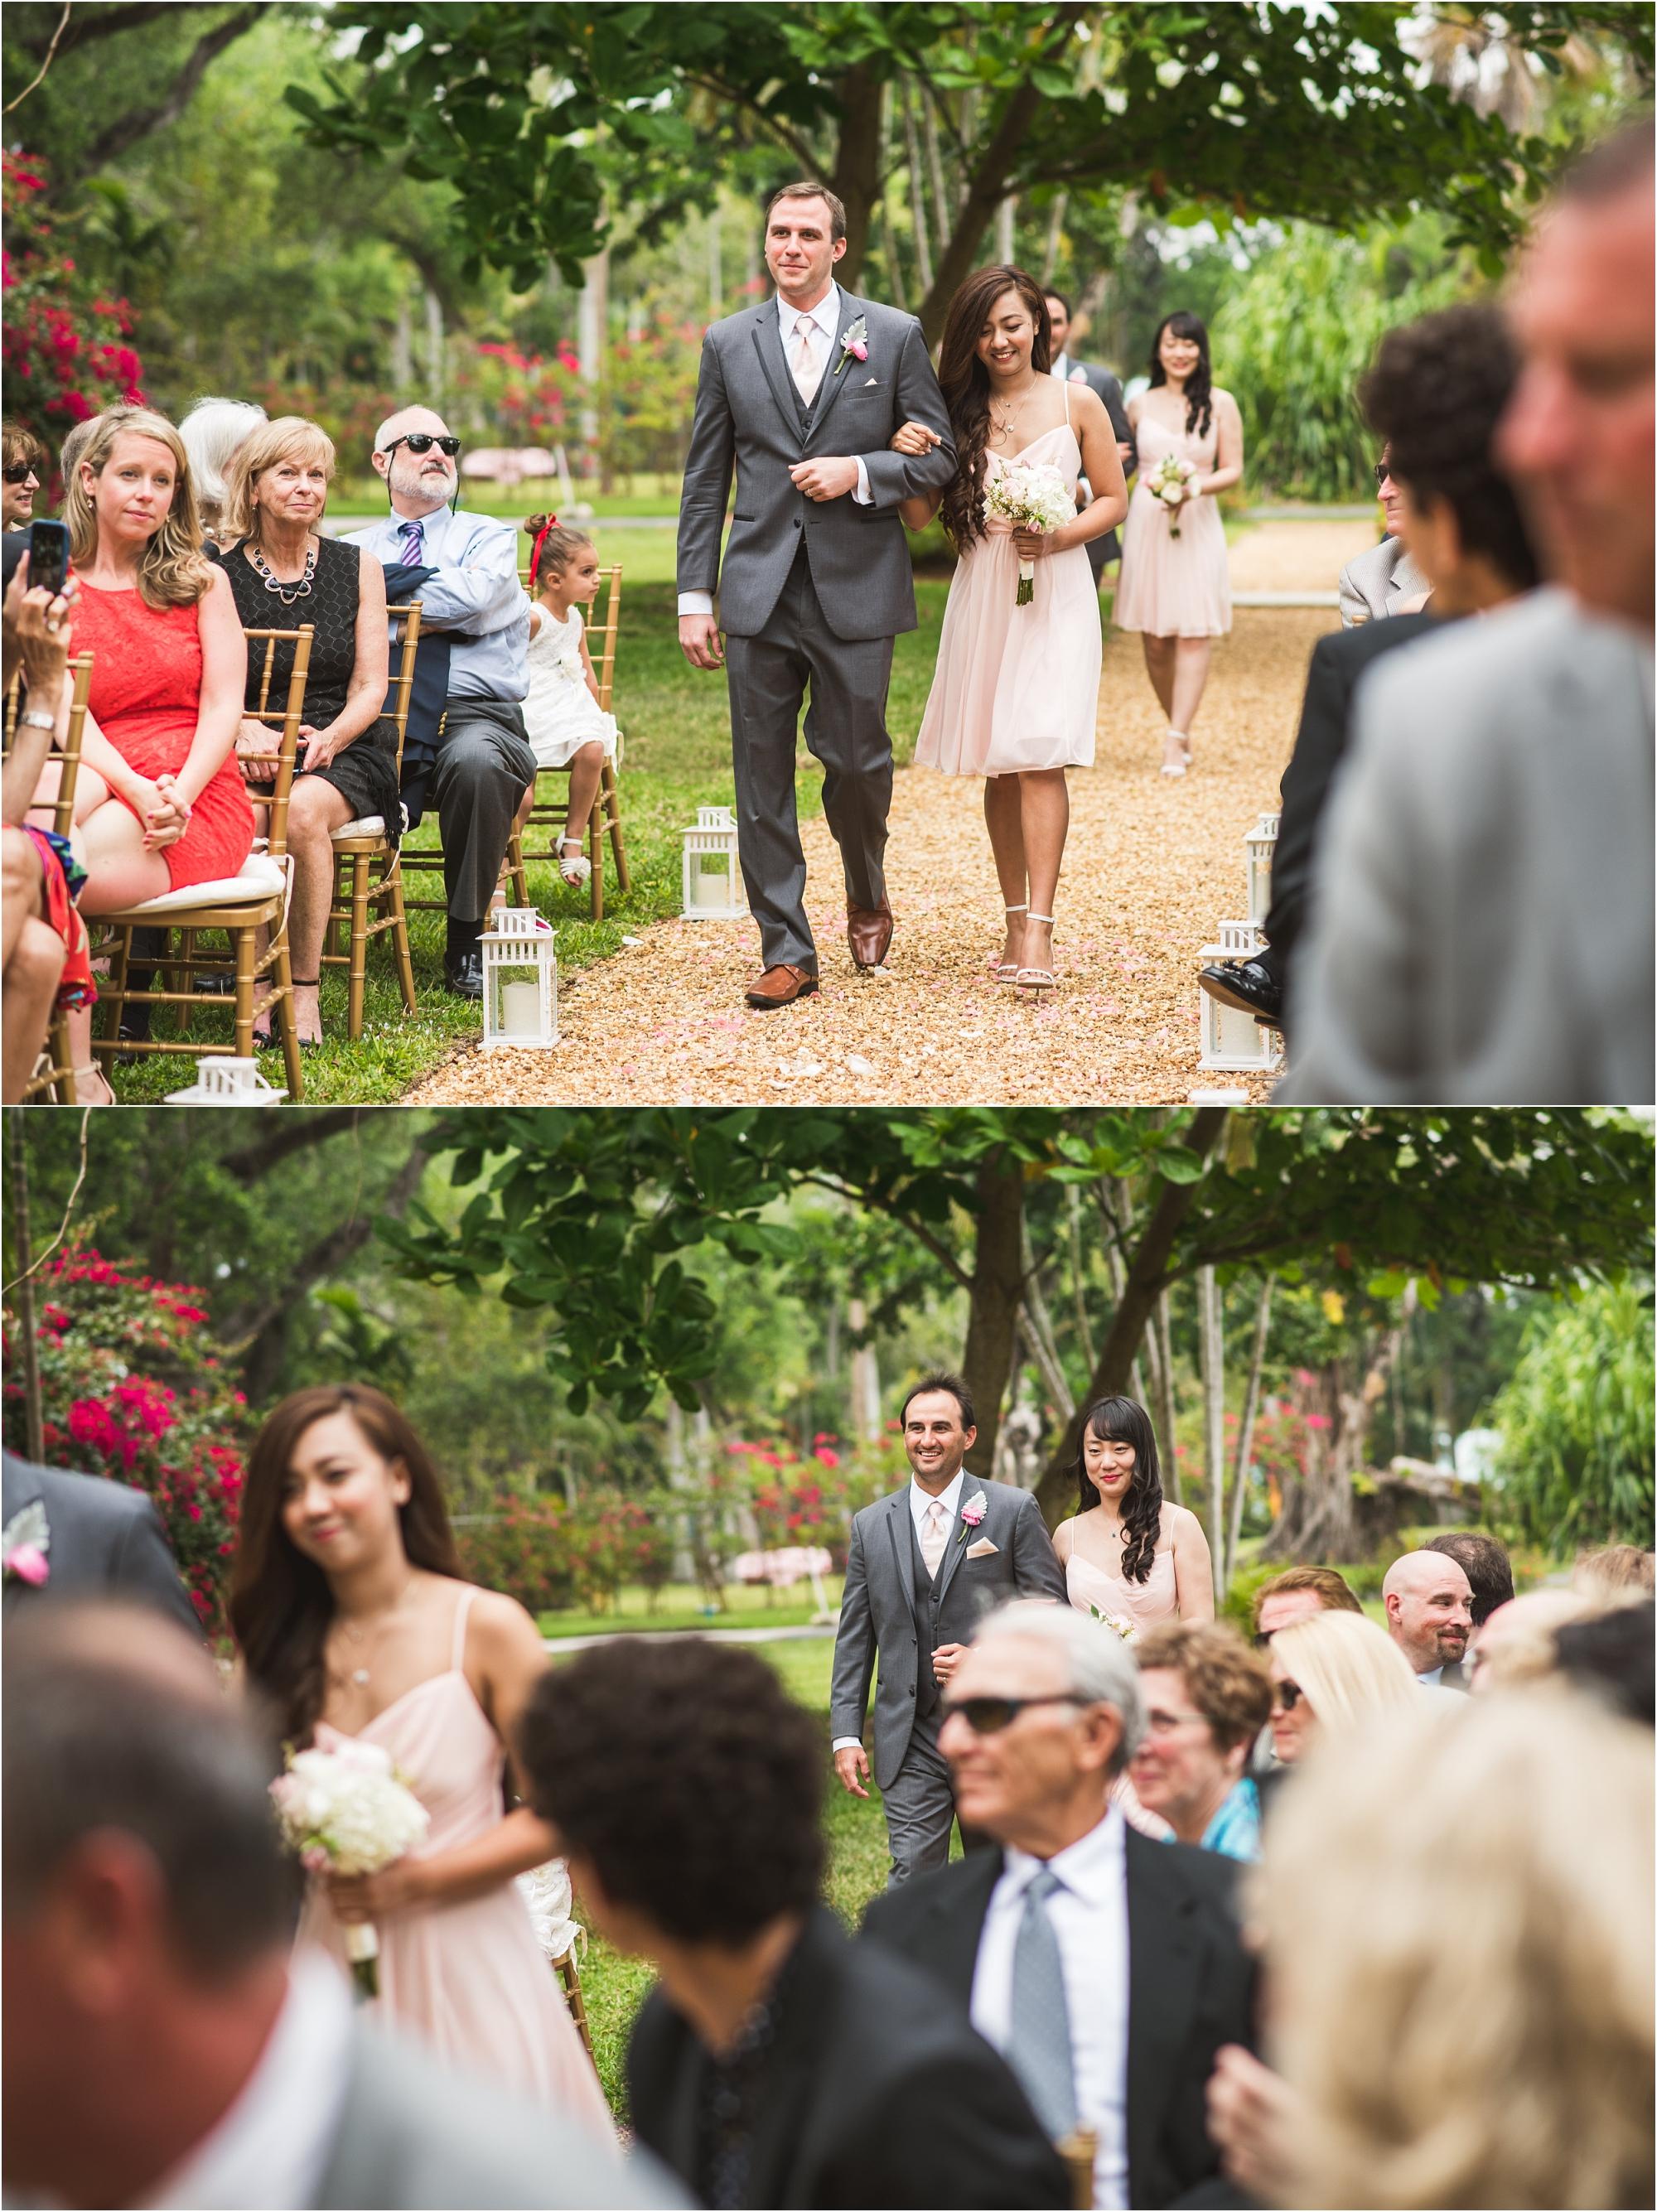 Spanish-Monastery-miami-beach-outdoor-elegant-wedding-photographer-jessenia-gonzalez_1151.jpg